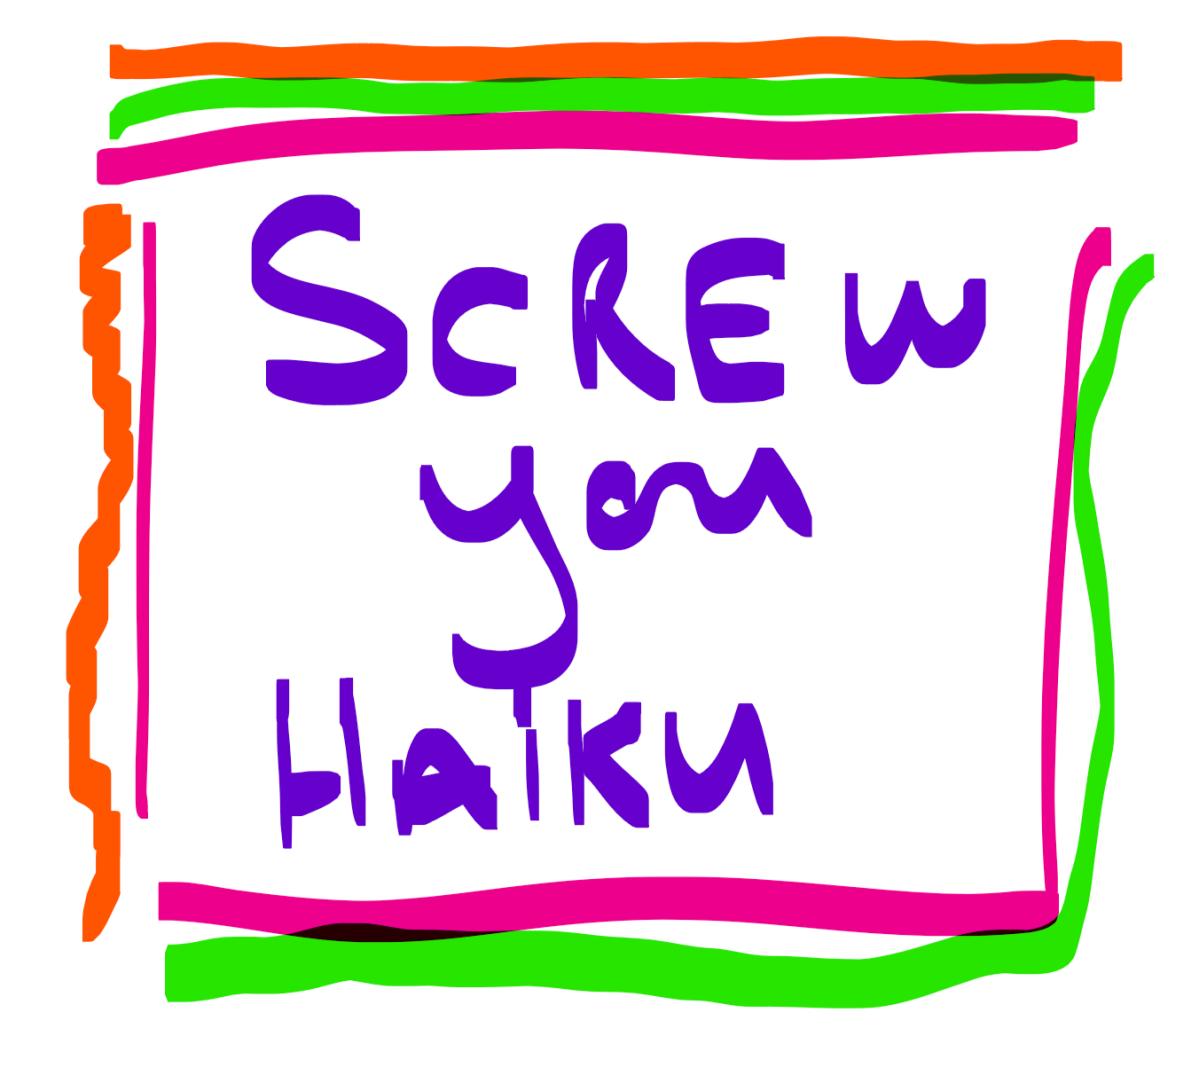 Haiku perhaps?